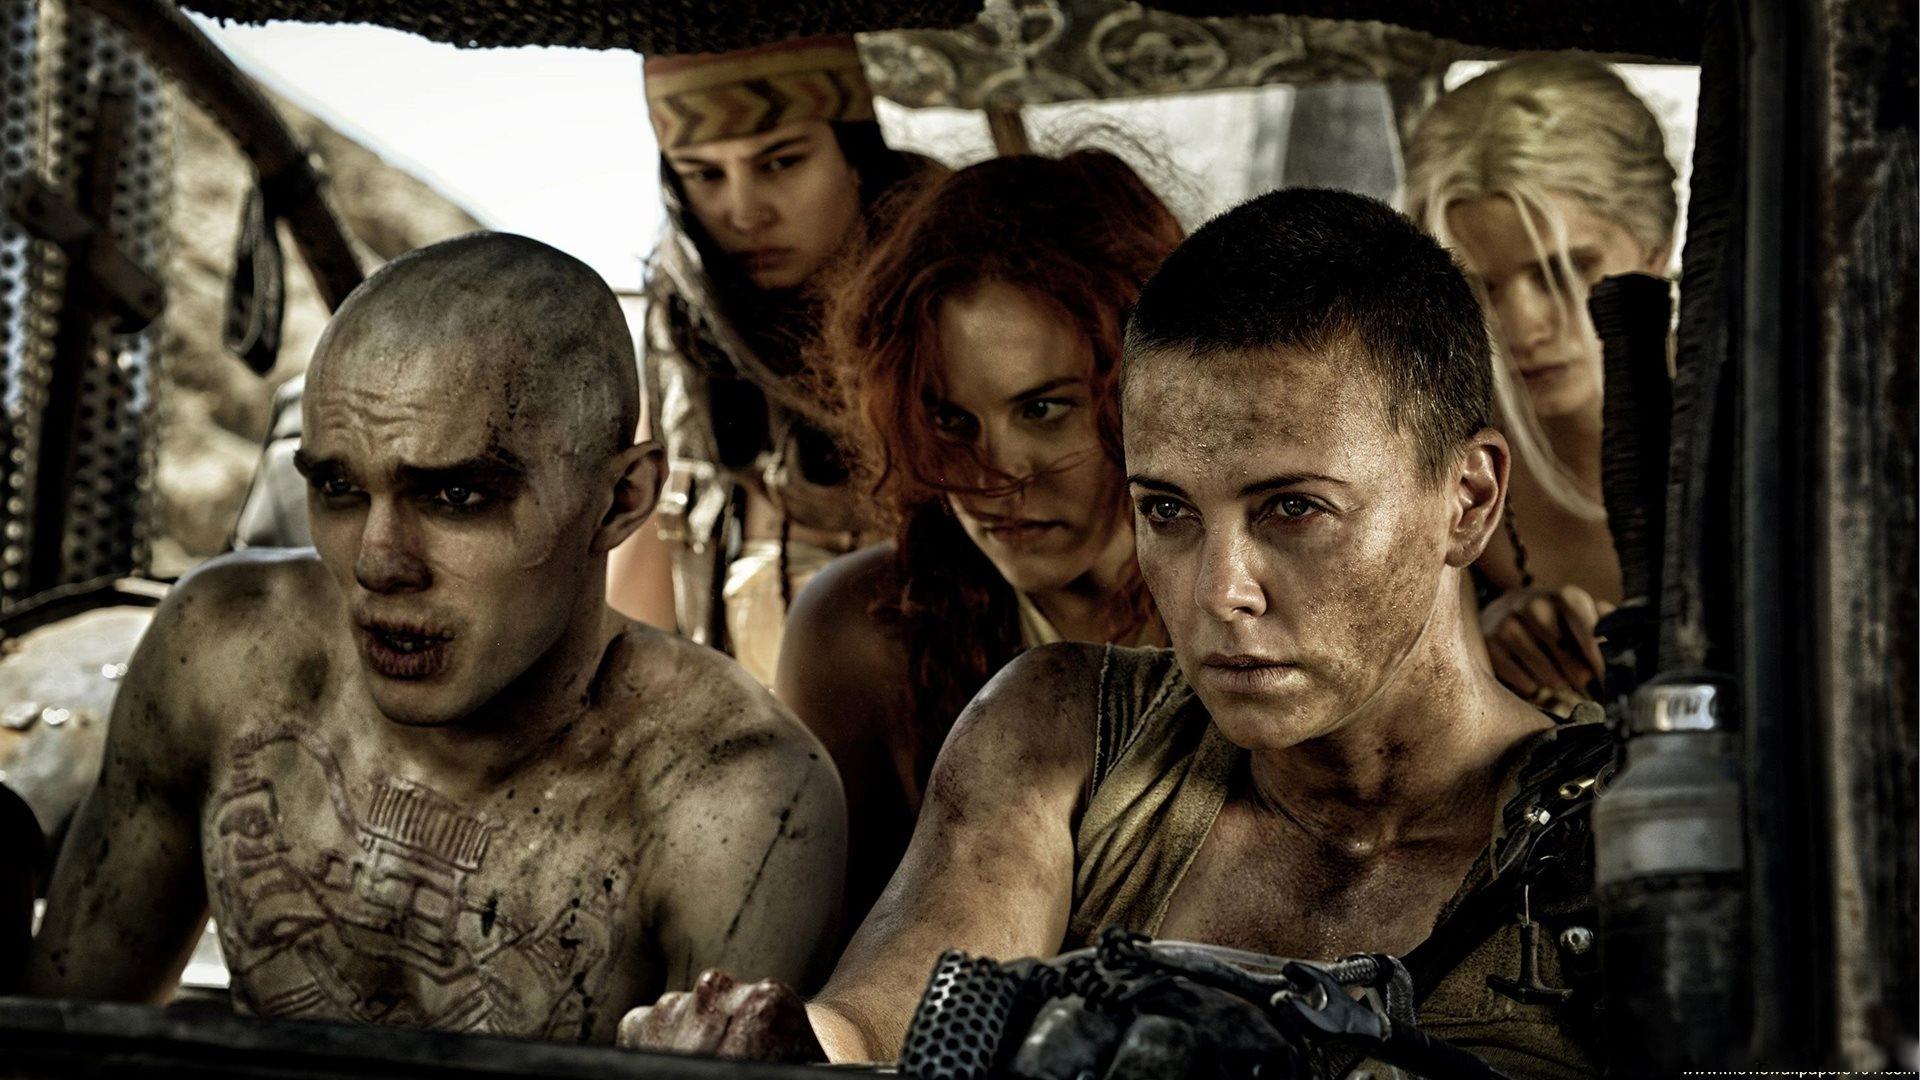 Mad Max Fury Road Teaser 2015 HD Wallpaper   Stylish HD Wallpapers 1920x1080